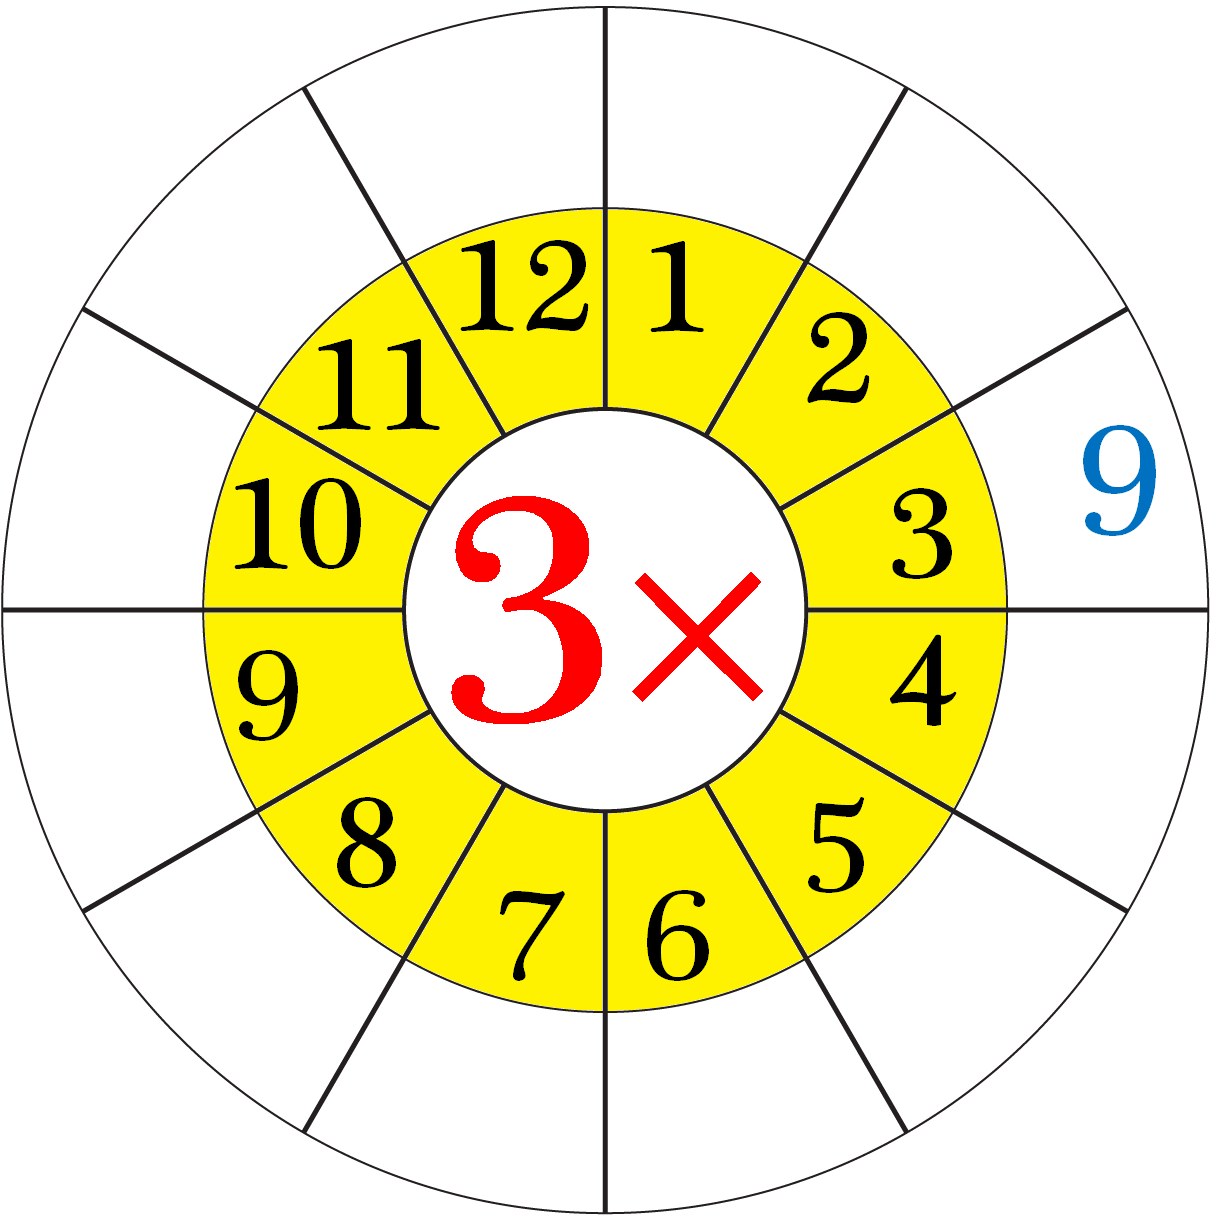 Worksheet On Multiplication Table Of 3